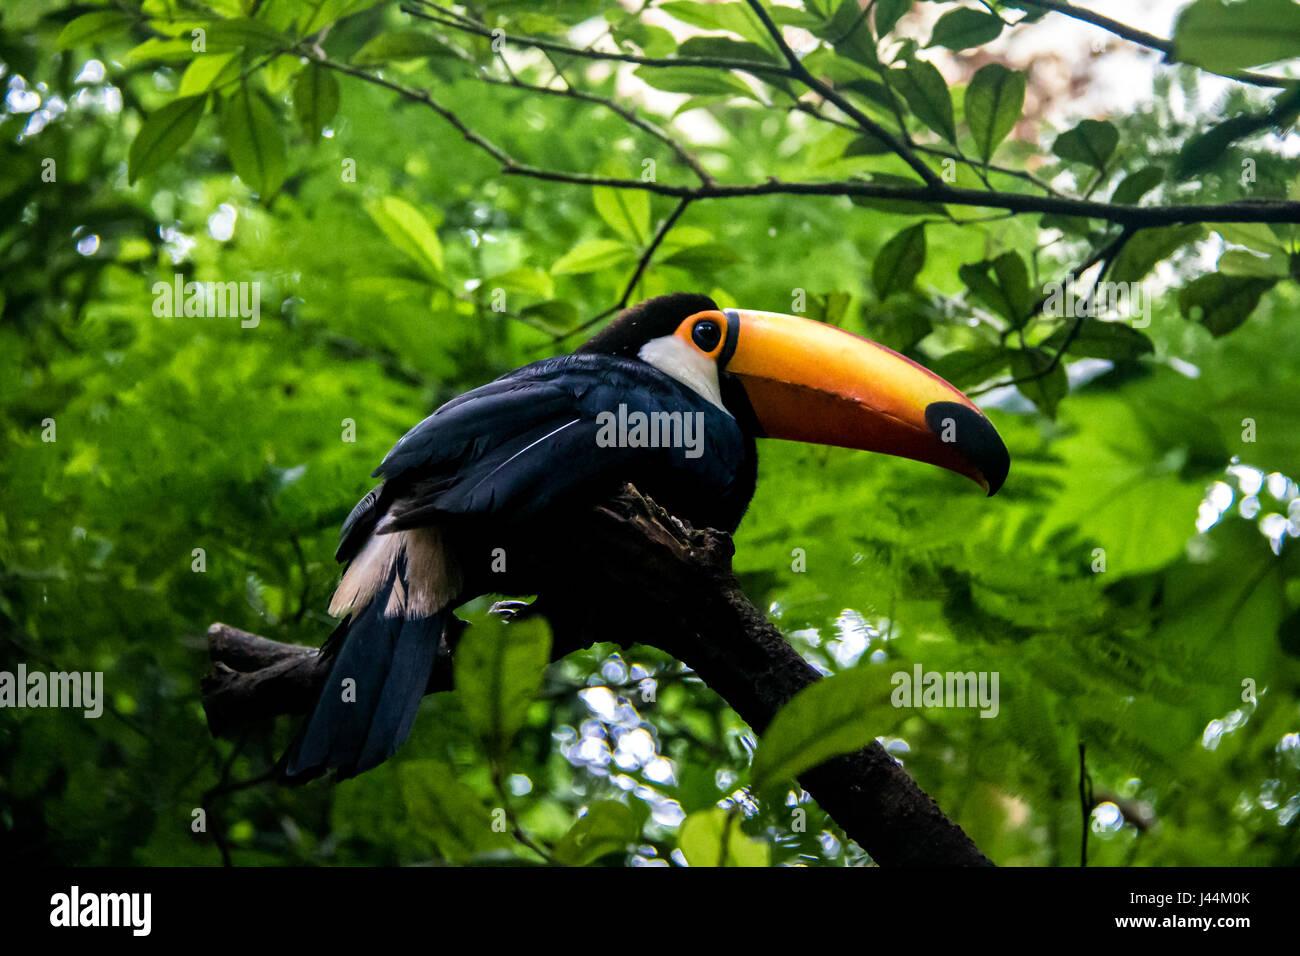 Toucan at Parque das Aves - Foz do Iguacu, Parana, Brazil - Stock Image